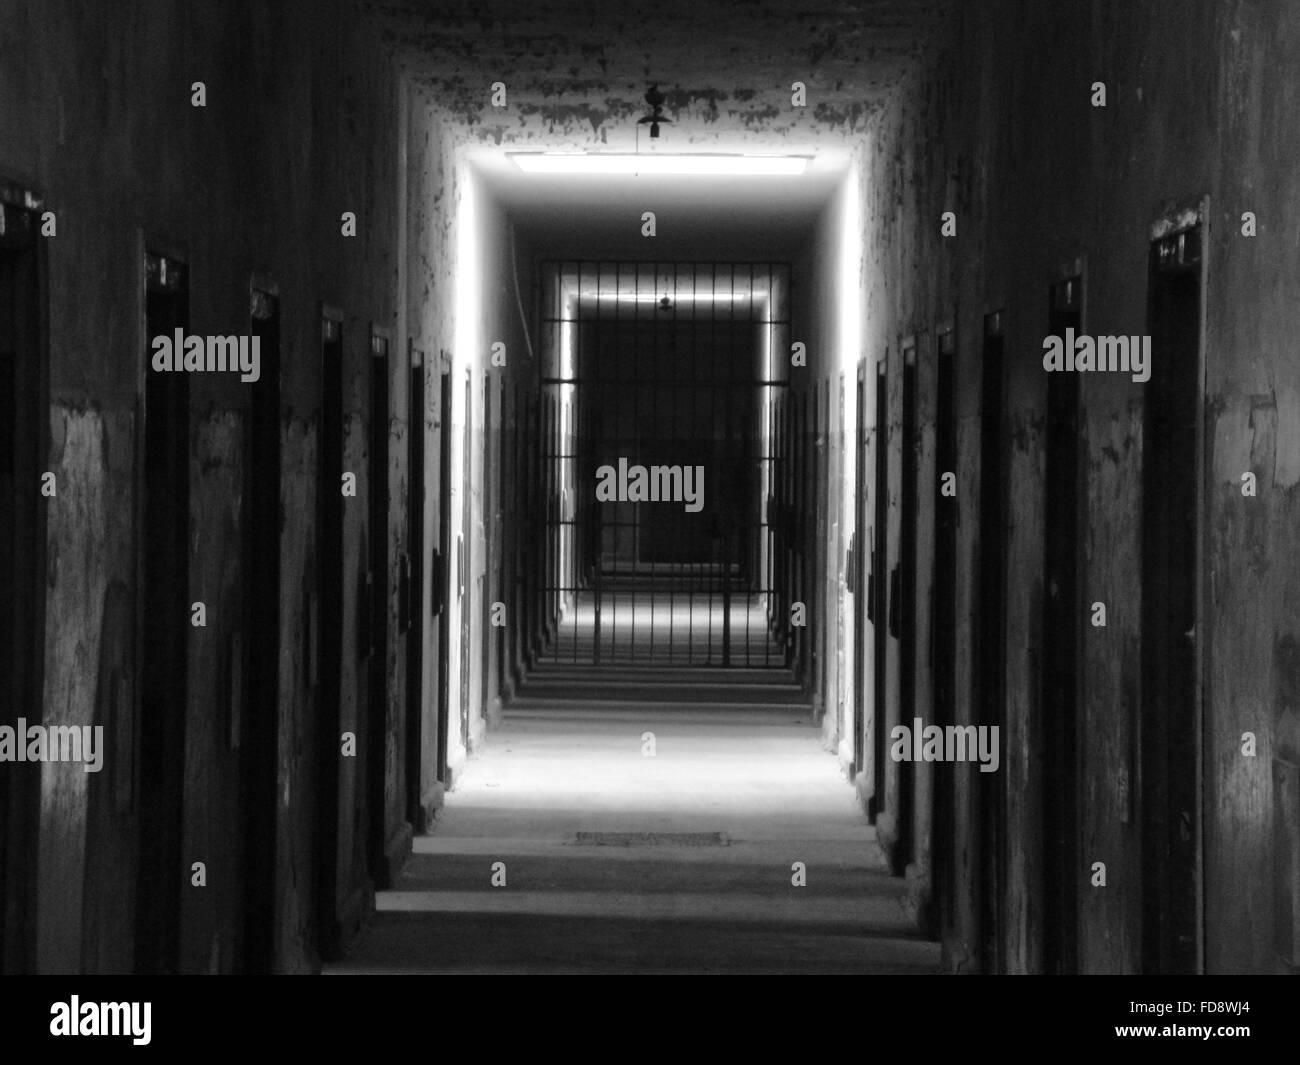 Interiors Of A Prison - Stock Image